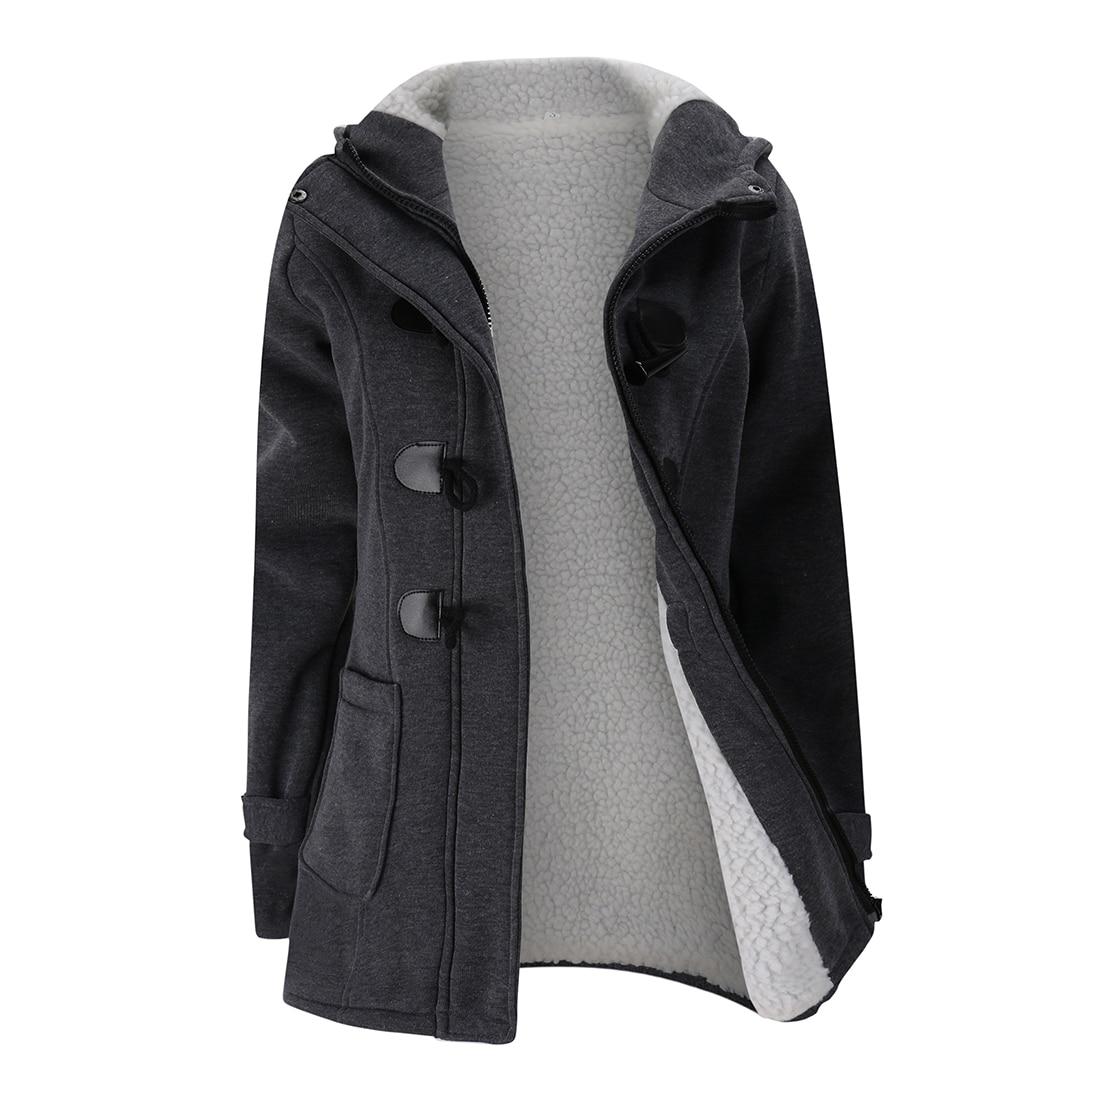 Brandit James Coat Warm Windproof Casual Lined Collar Long Trench Jacket Grey